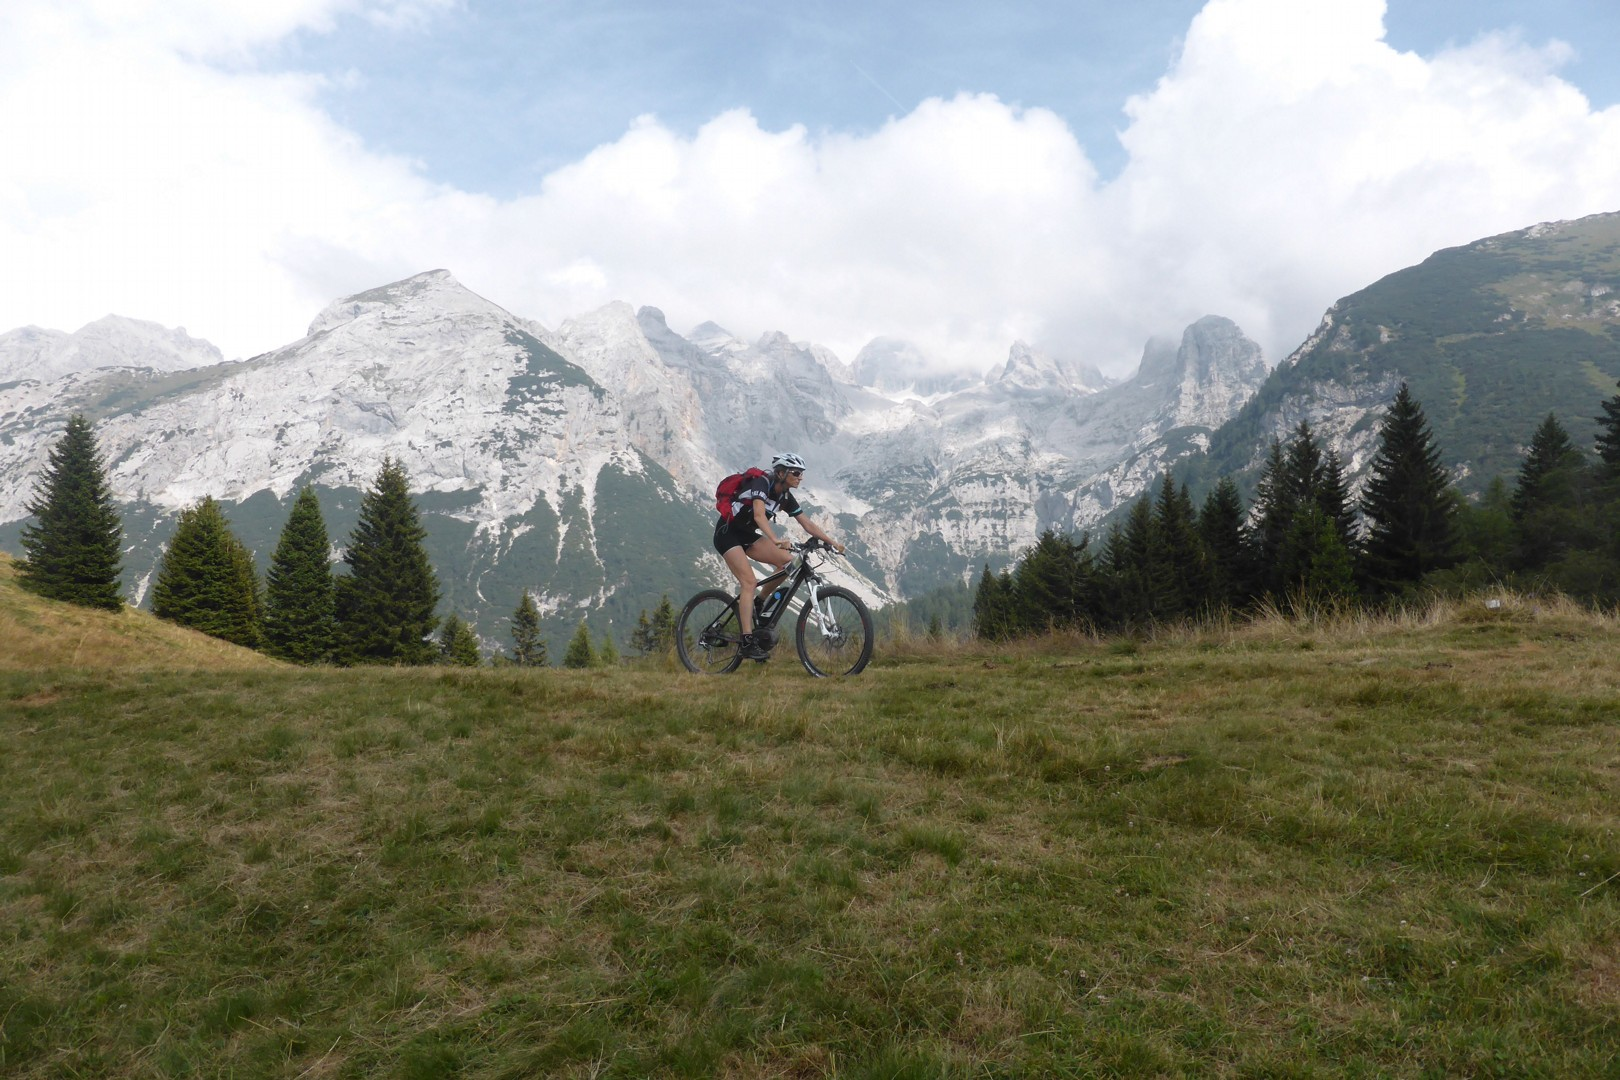 Dolomiti MTB - 1328.jpg - Italy - Dolomites of Brenta - Guided Mountain Bike Holiday - Mountain Biking